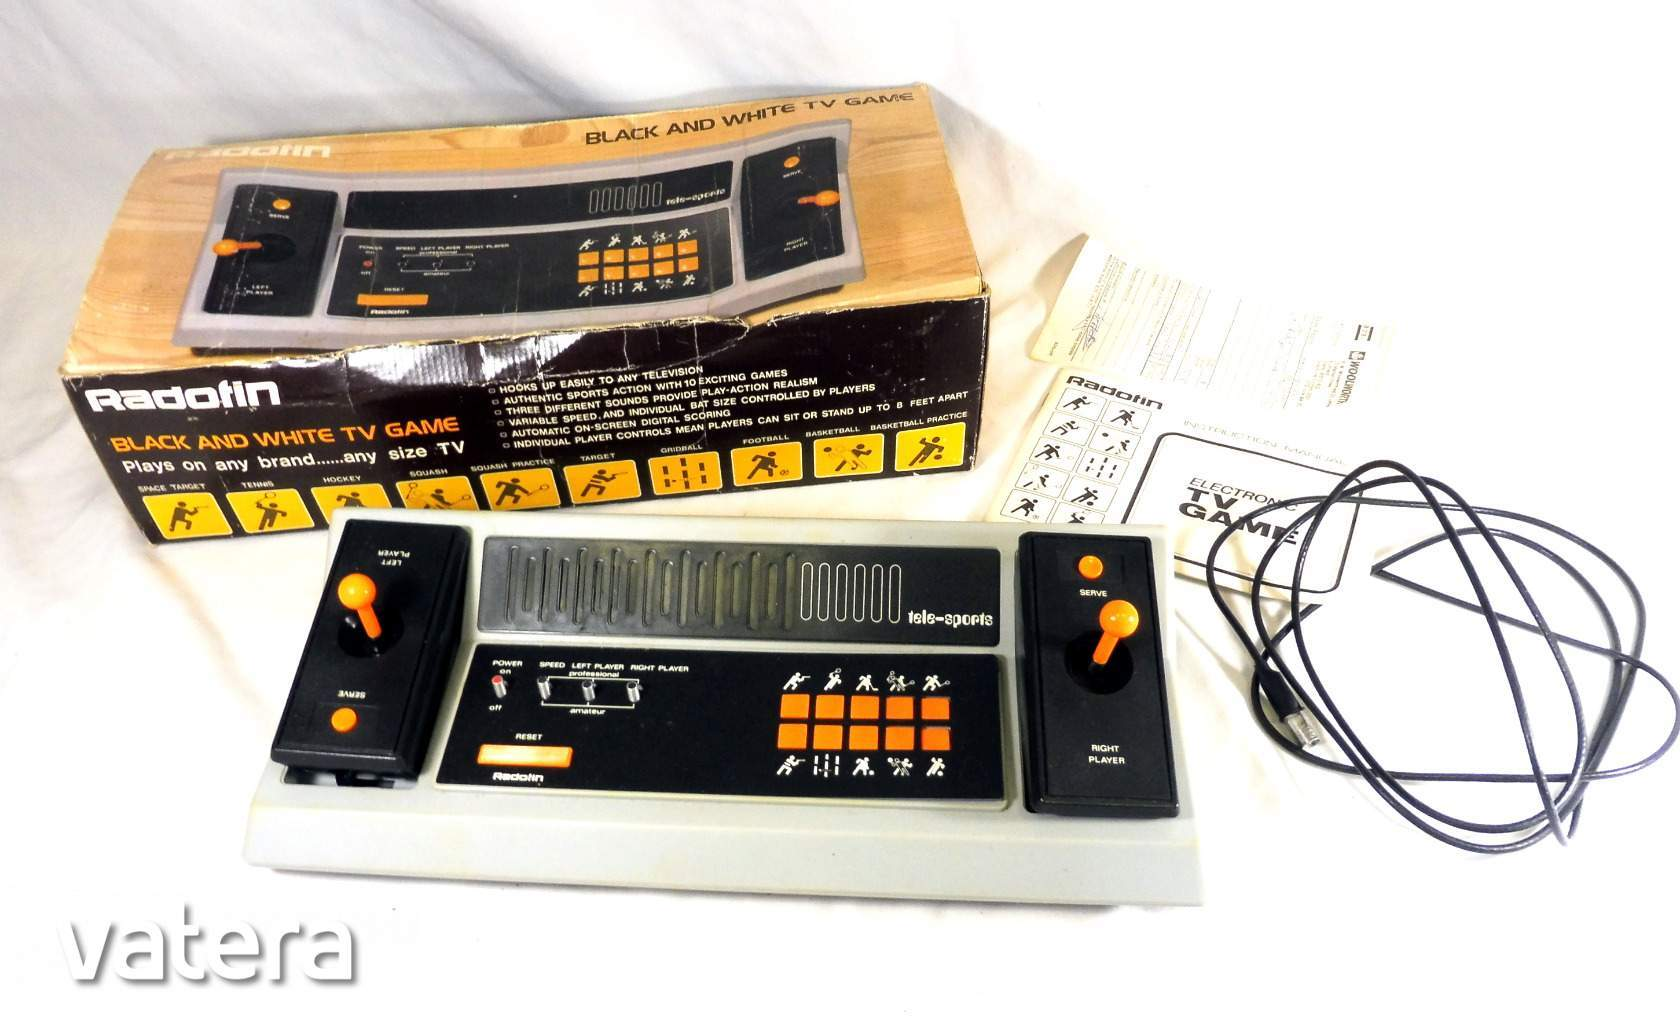 1978-bol-ritka-retro-radotin-tele-sport-tv-jatek-konzol-eredeti-dobozaban-x-43ea_1_big.jpg